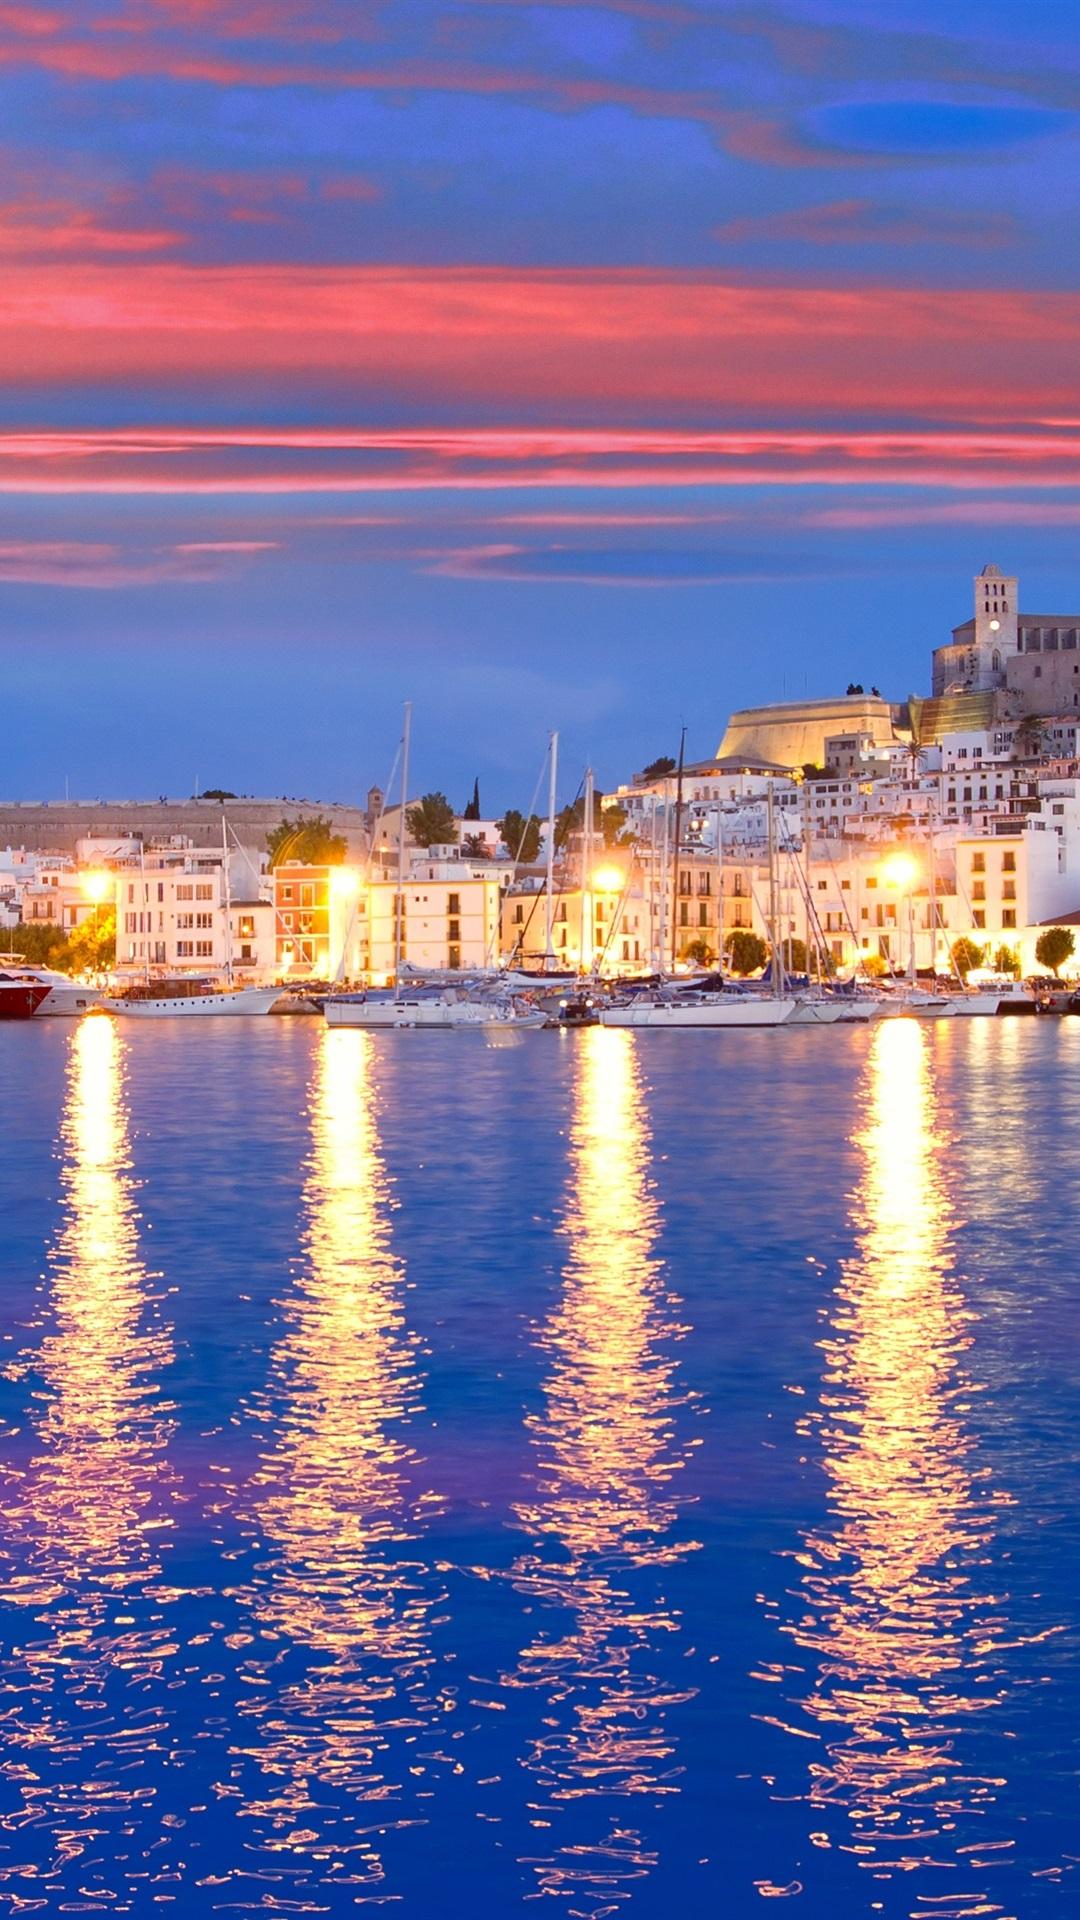 Eivissa スペイン 桟橋 ヨット 湾 海 住宅 ライト 夜 1080x19 Iphone 8 7 6 6s Plus 壁紙 背景 画像